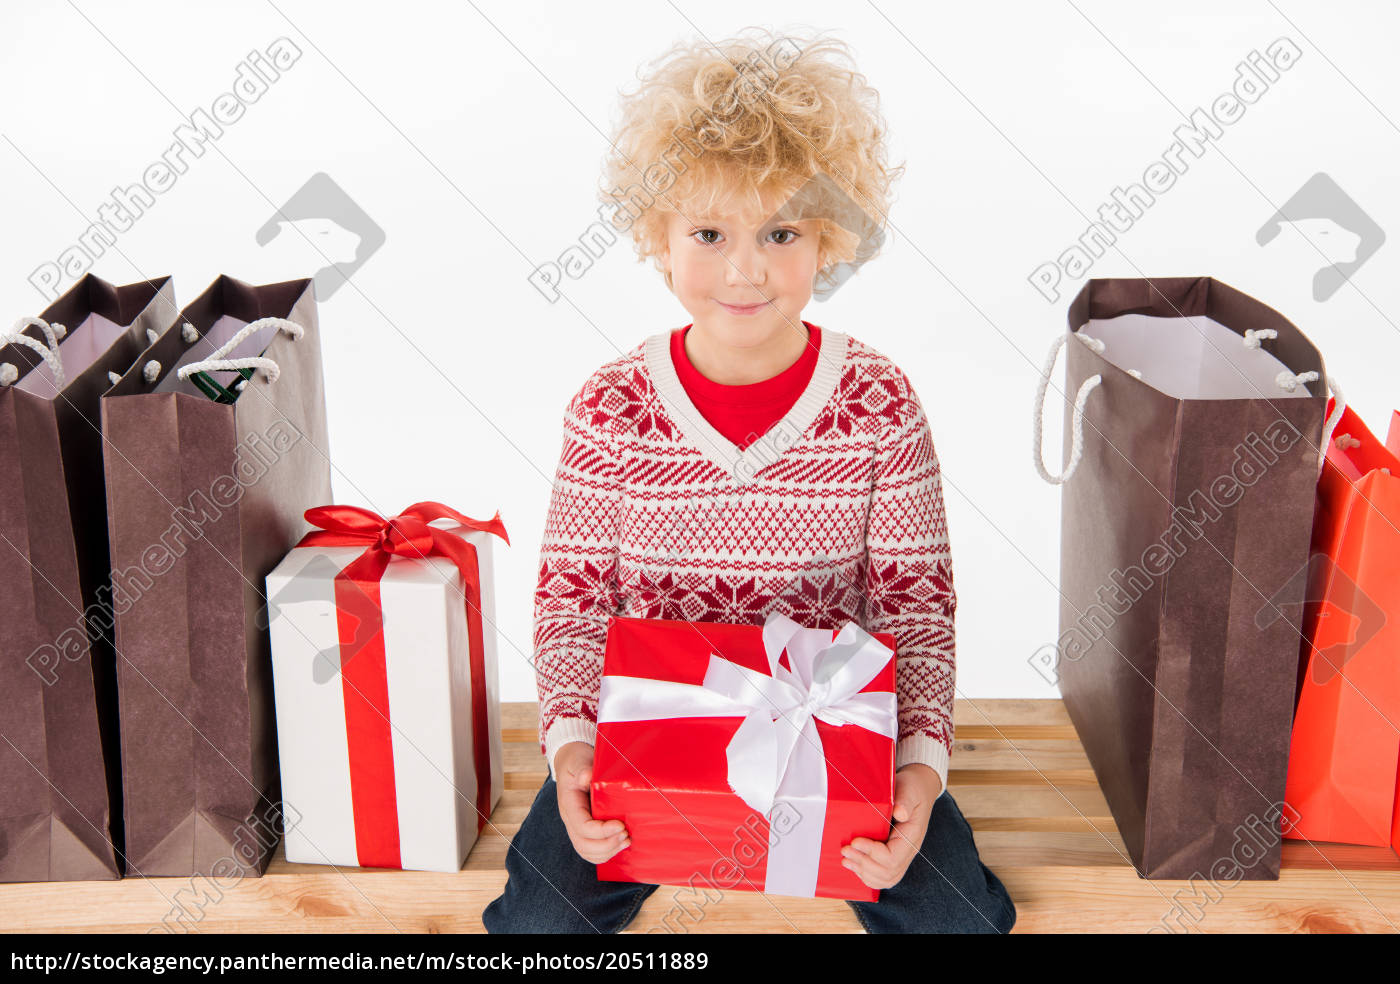 niño, feliz, sosteniendo, caja, de, regalo - 20511889